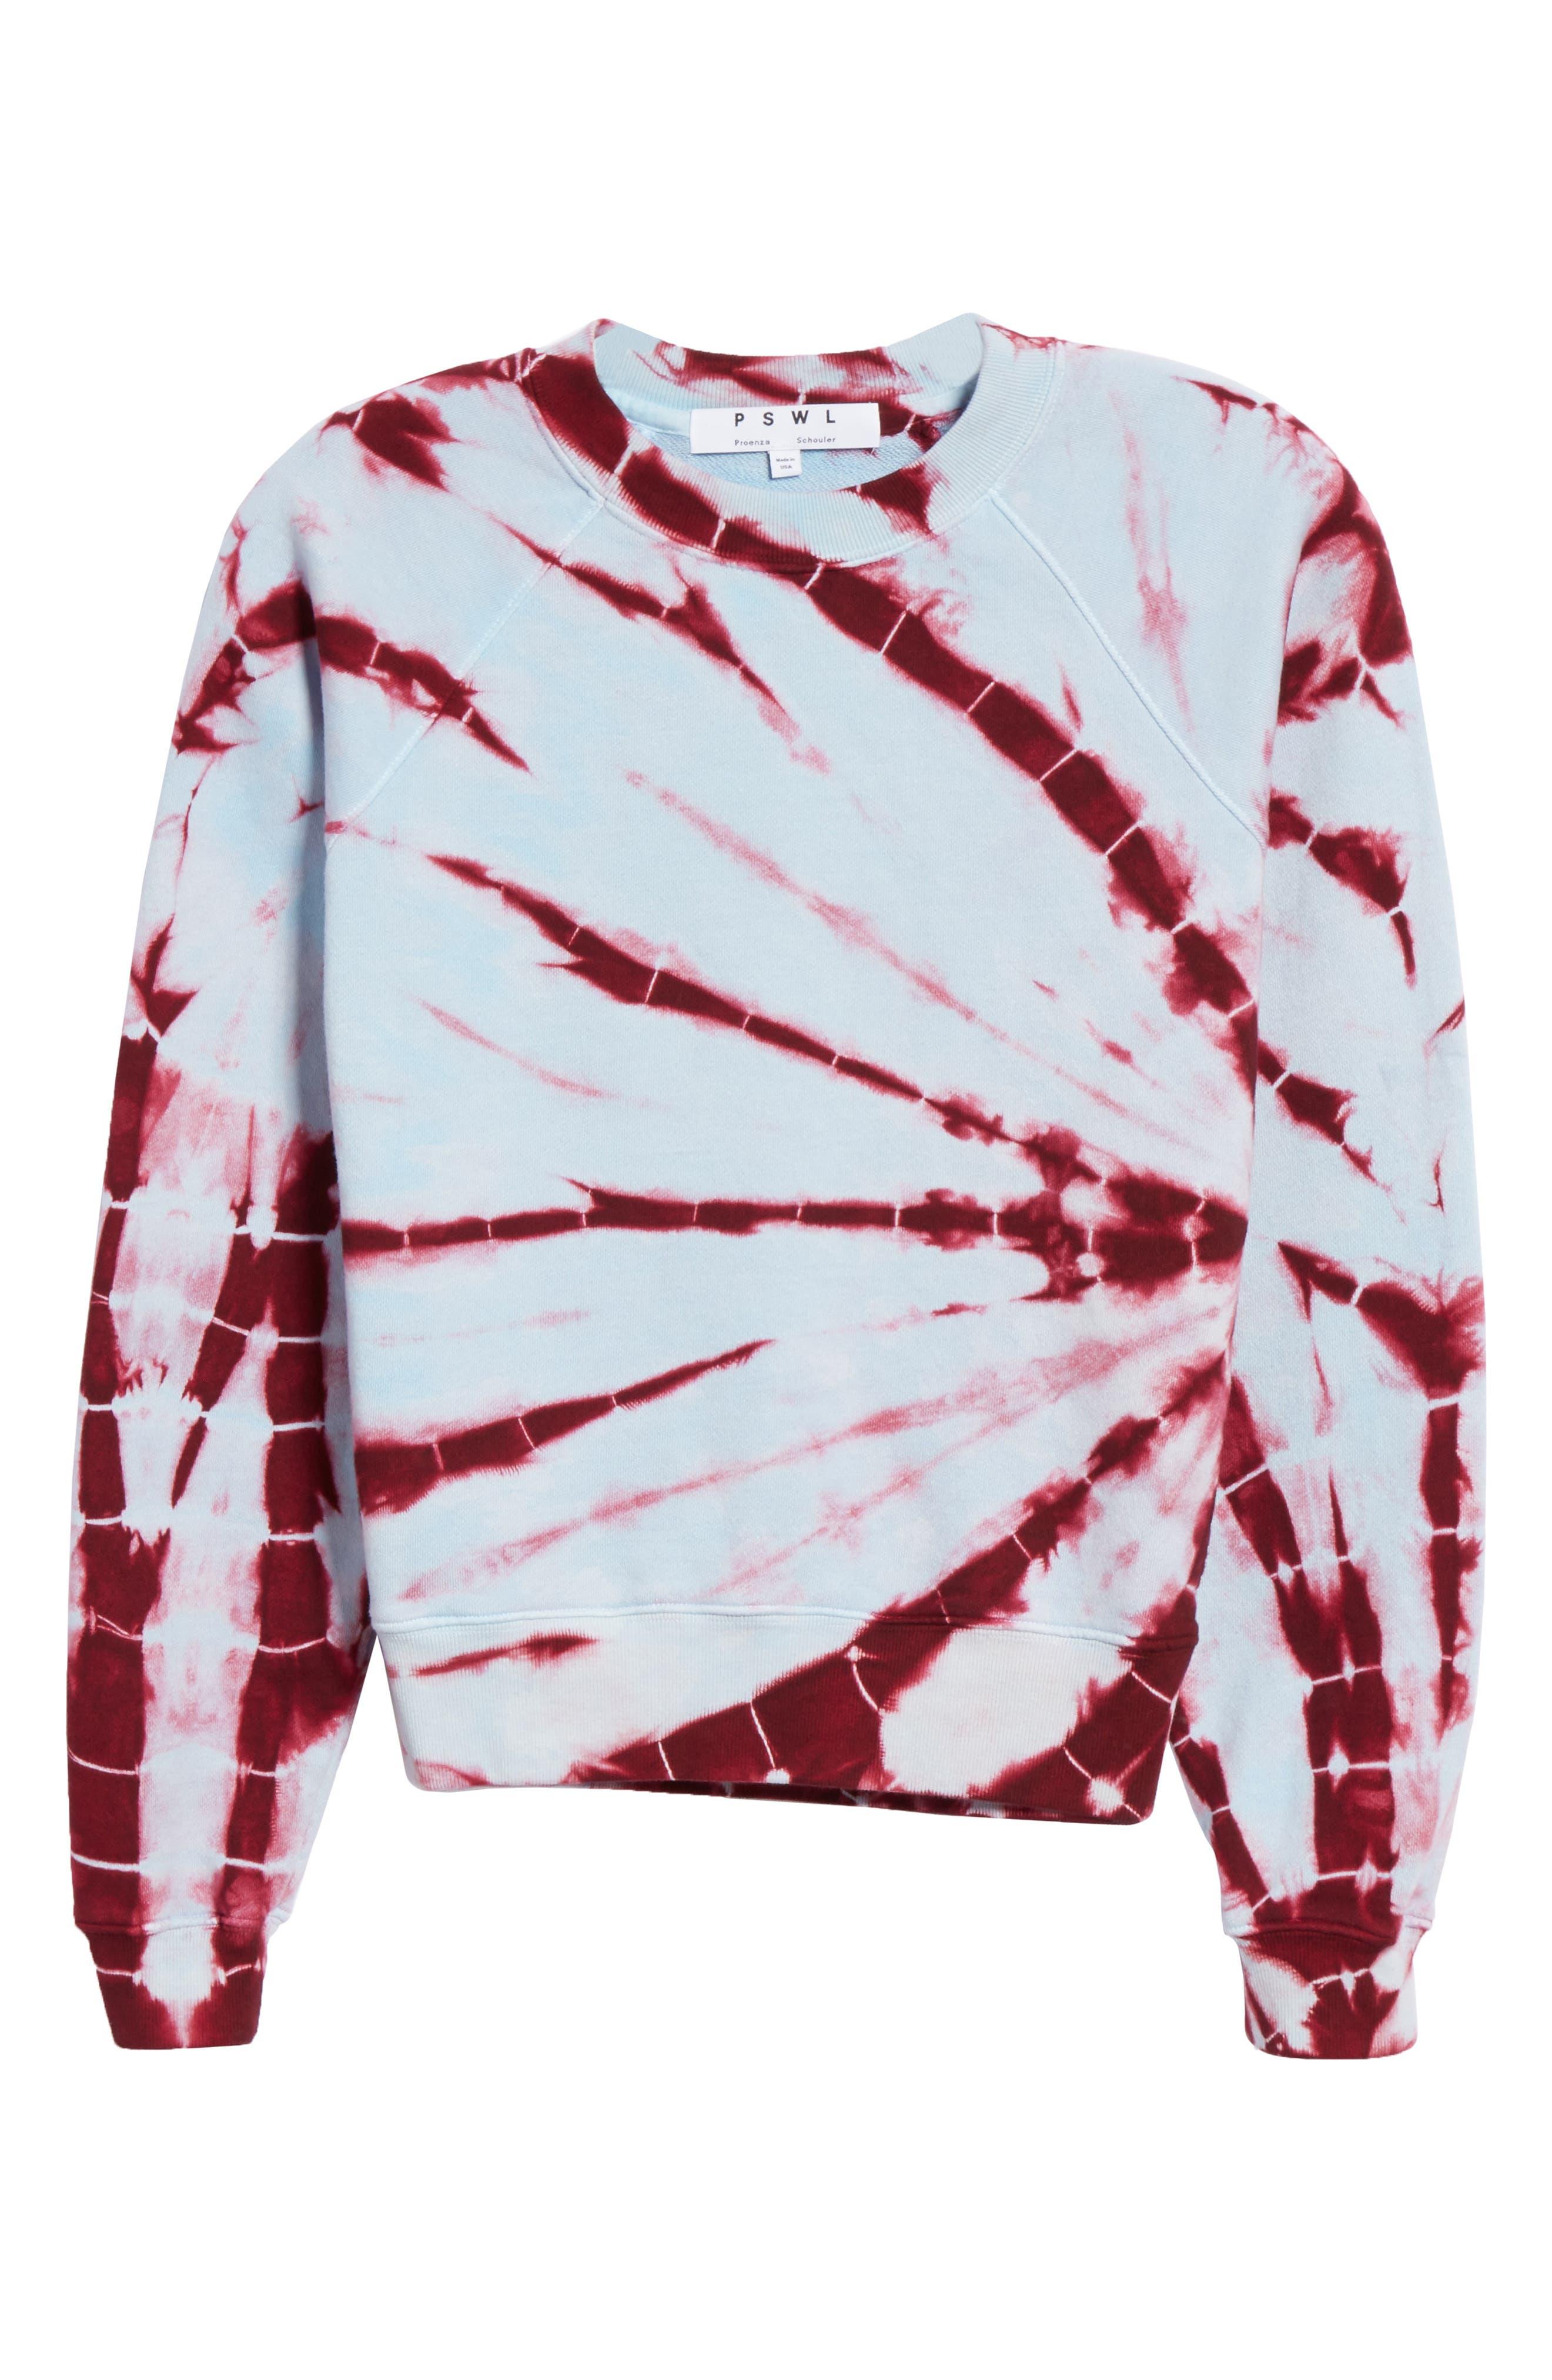 PROENZA SCHOULER, PSWL Tie Dye Sweatshirt, Alternate thumbnail 6, color, BABY BLUE/ RED TIE DYE